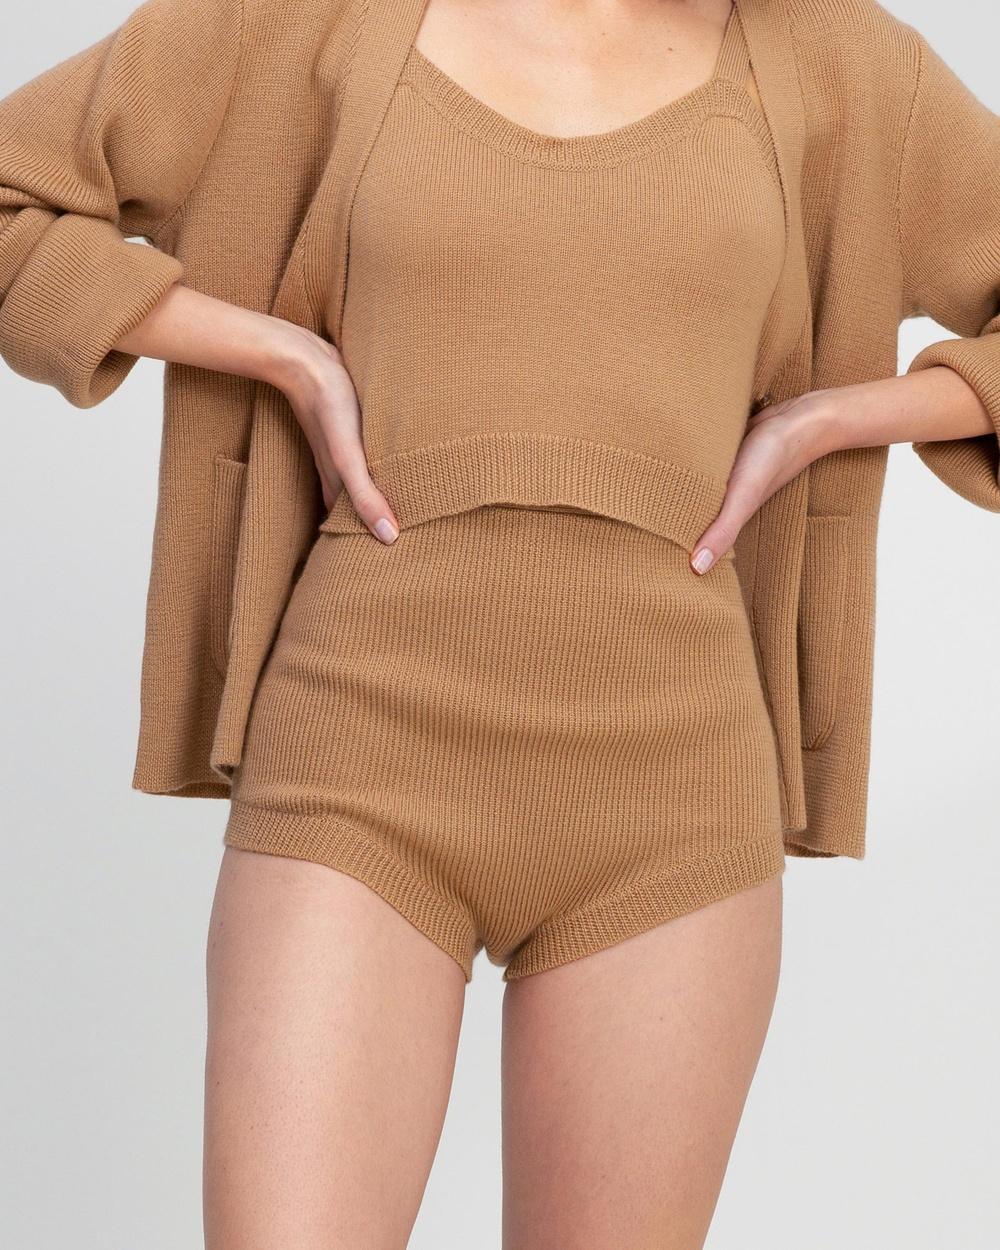 AERE Knit Shorts High-Waisted Neutral